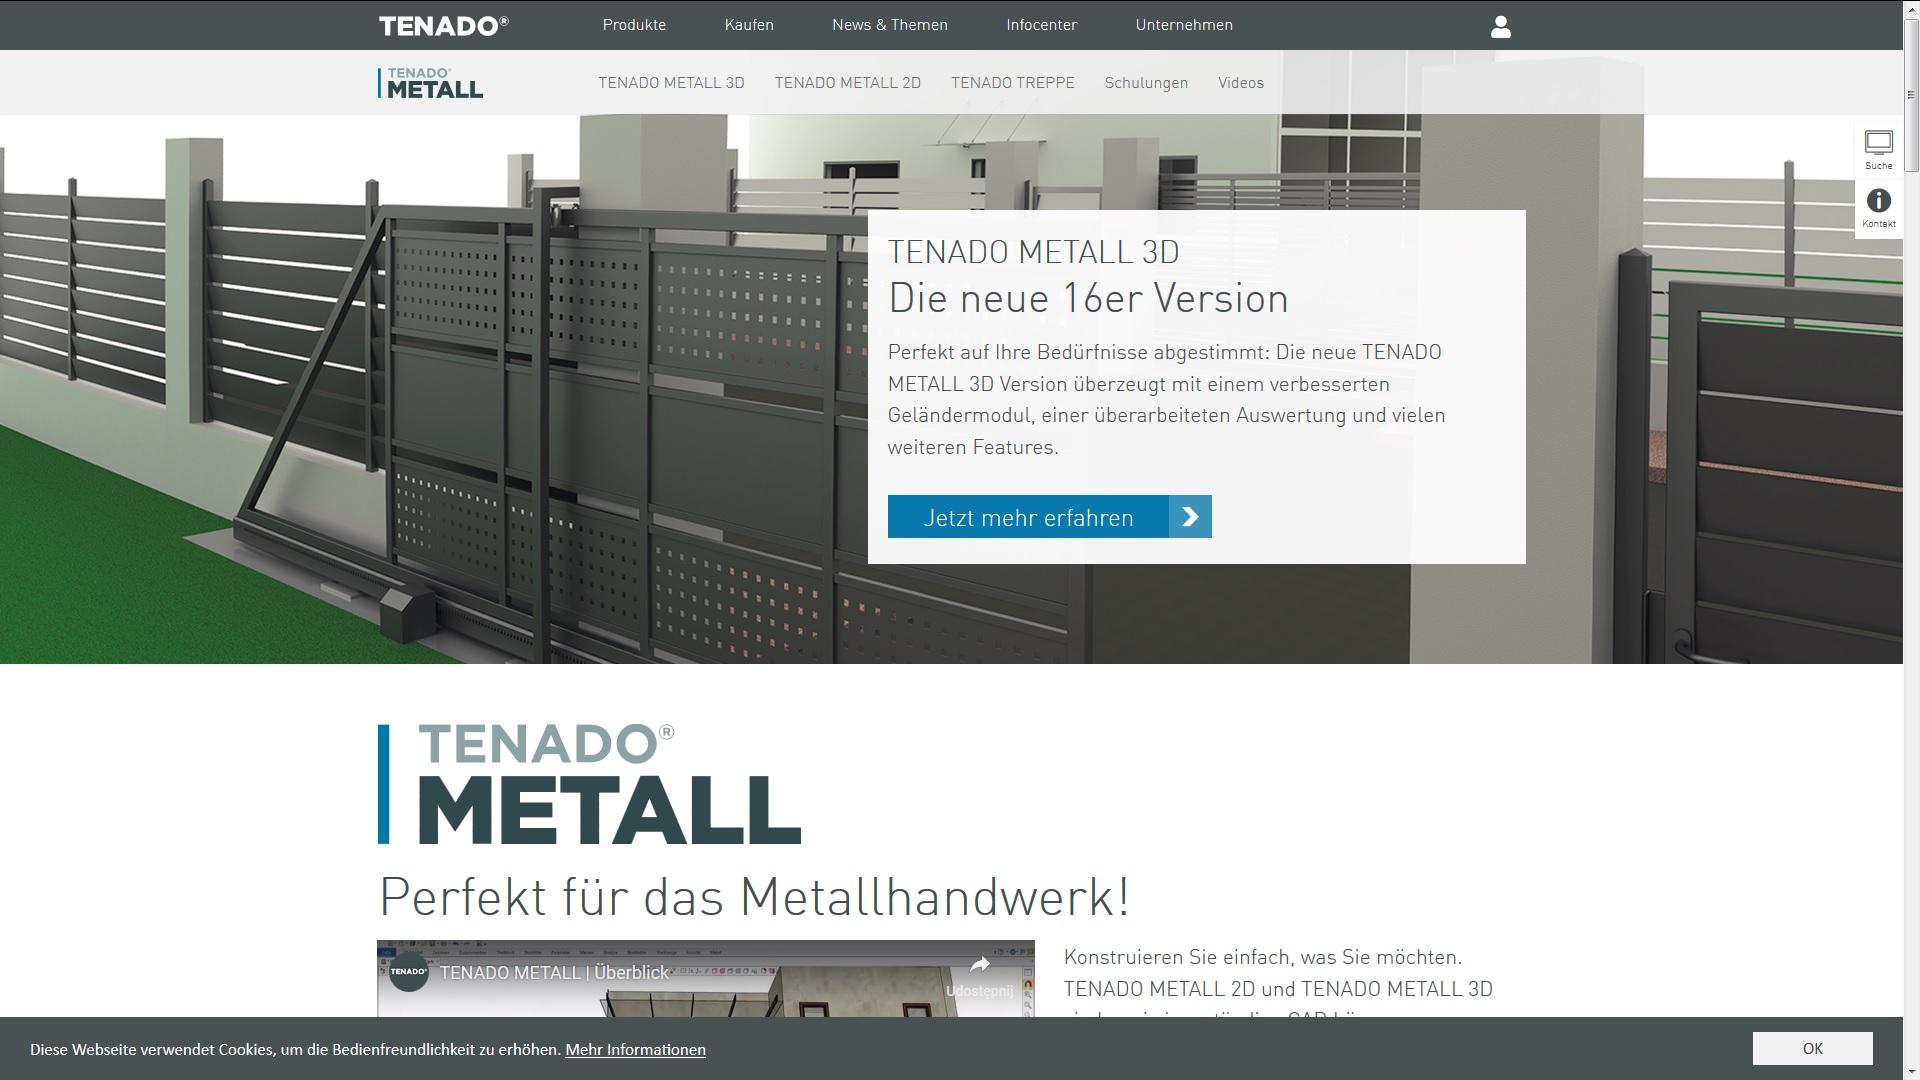 Tenado Metal